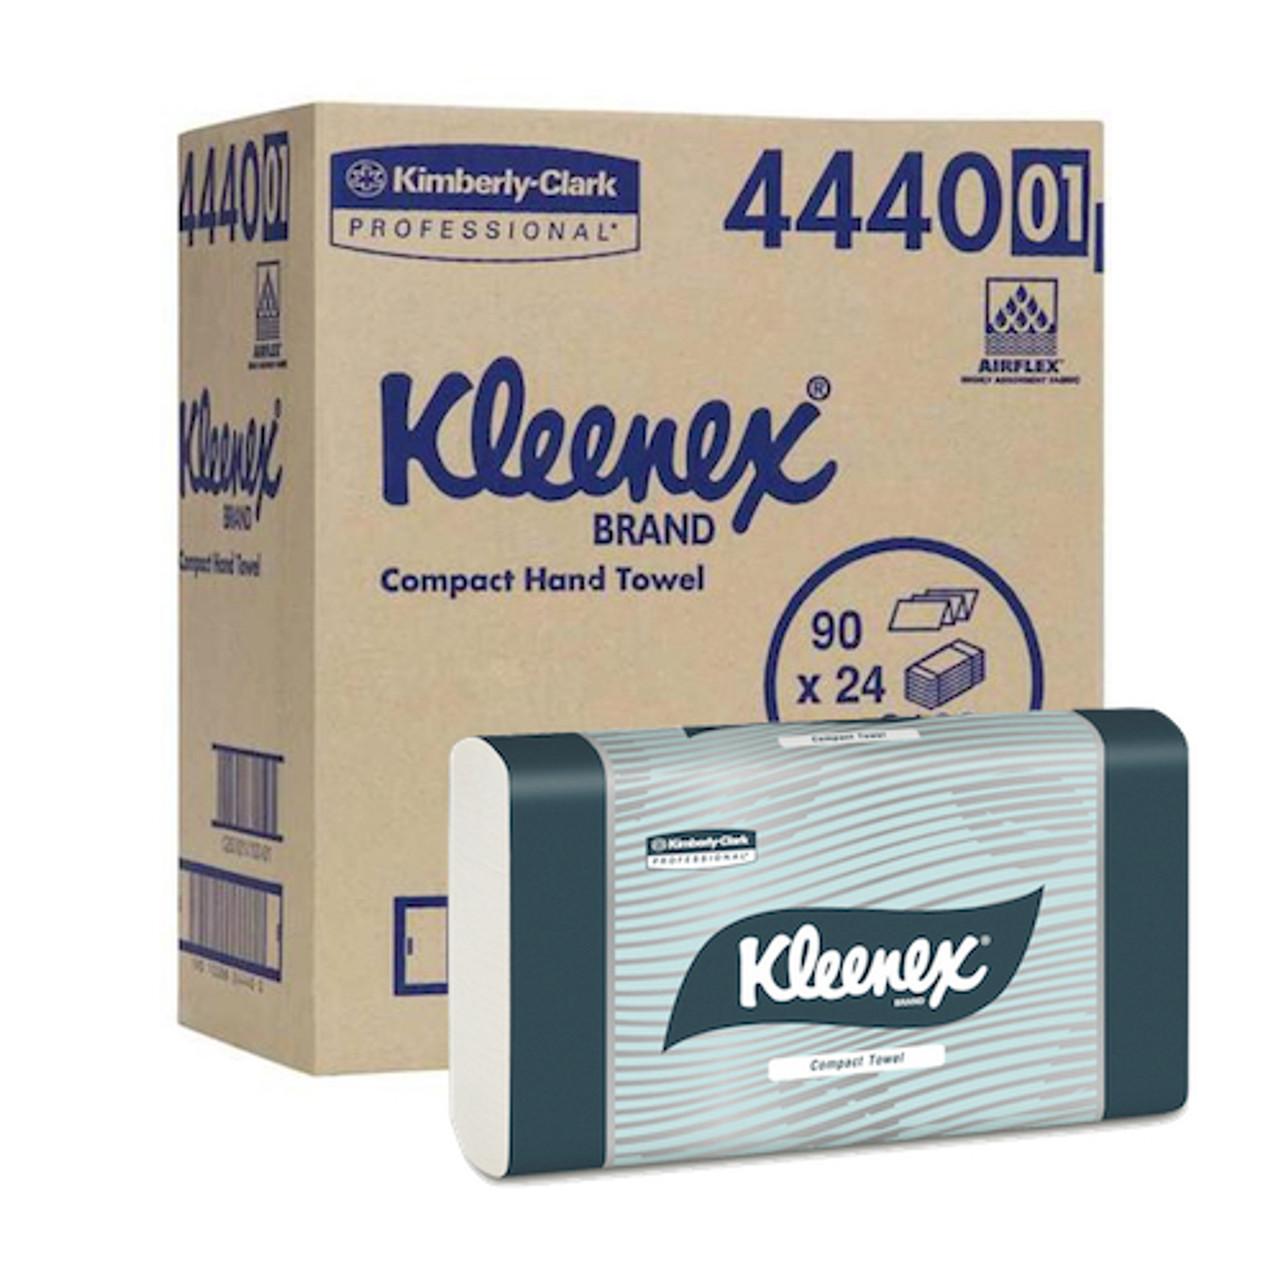 Kimberly Clark Kleenex Compact Hand Towel 24 Packs x 90 Towels (4440) Kimberly Clark Professional